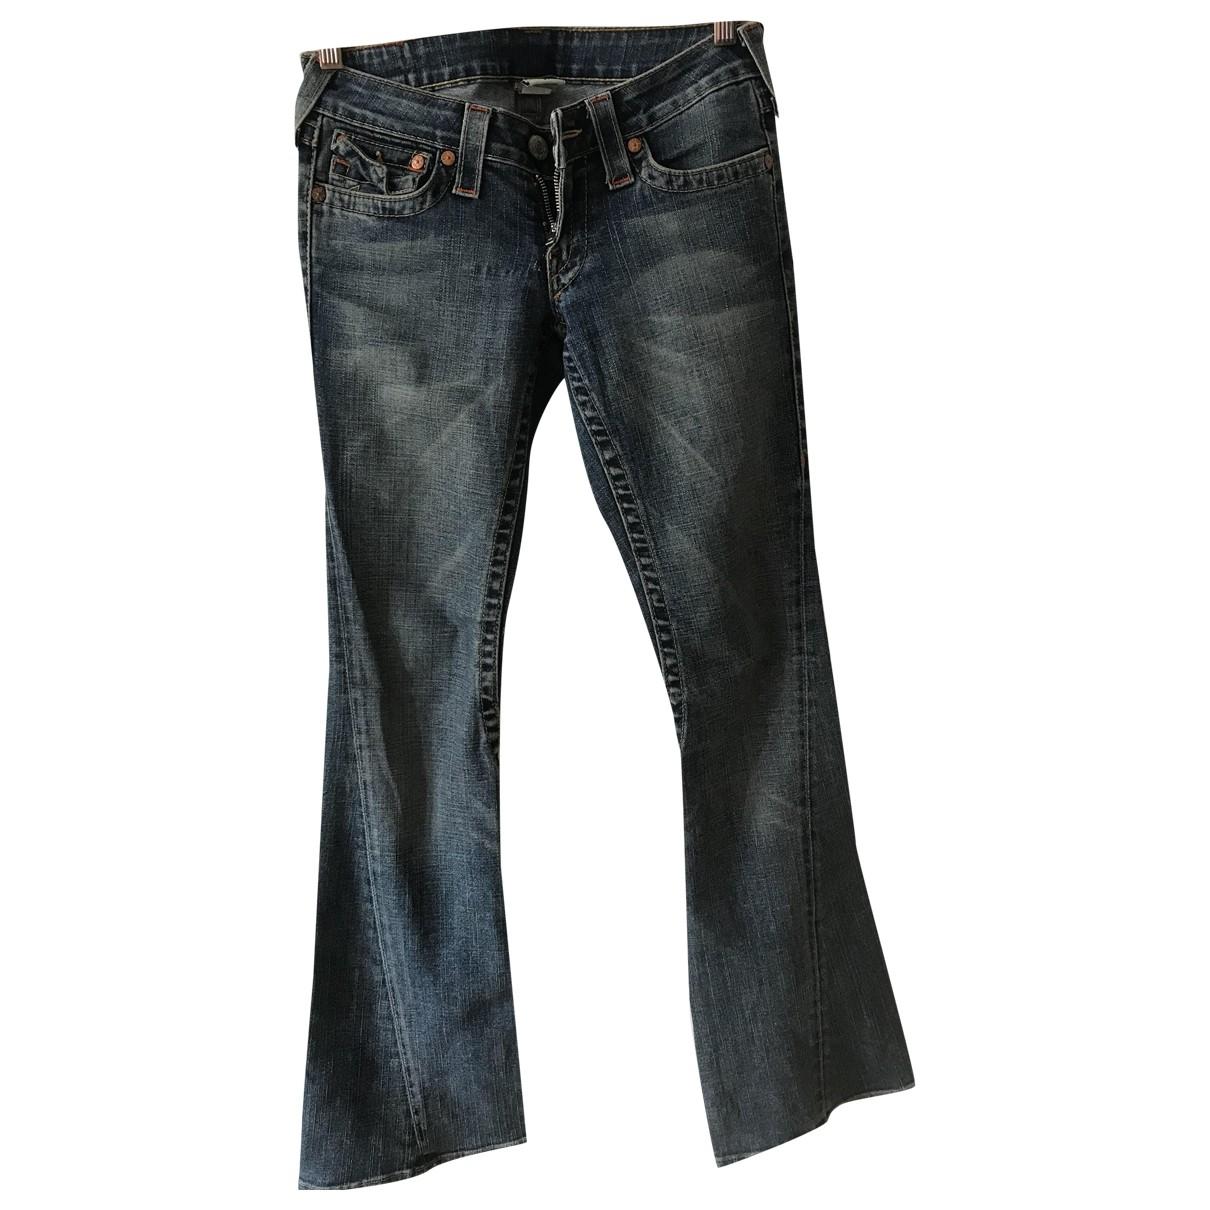 True Religion \N Blue Denim - Jeans Jeans for Women 27 US